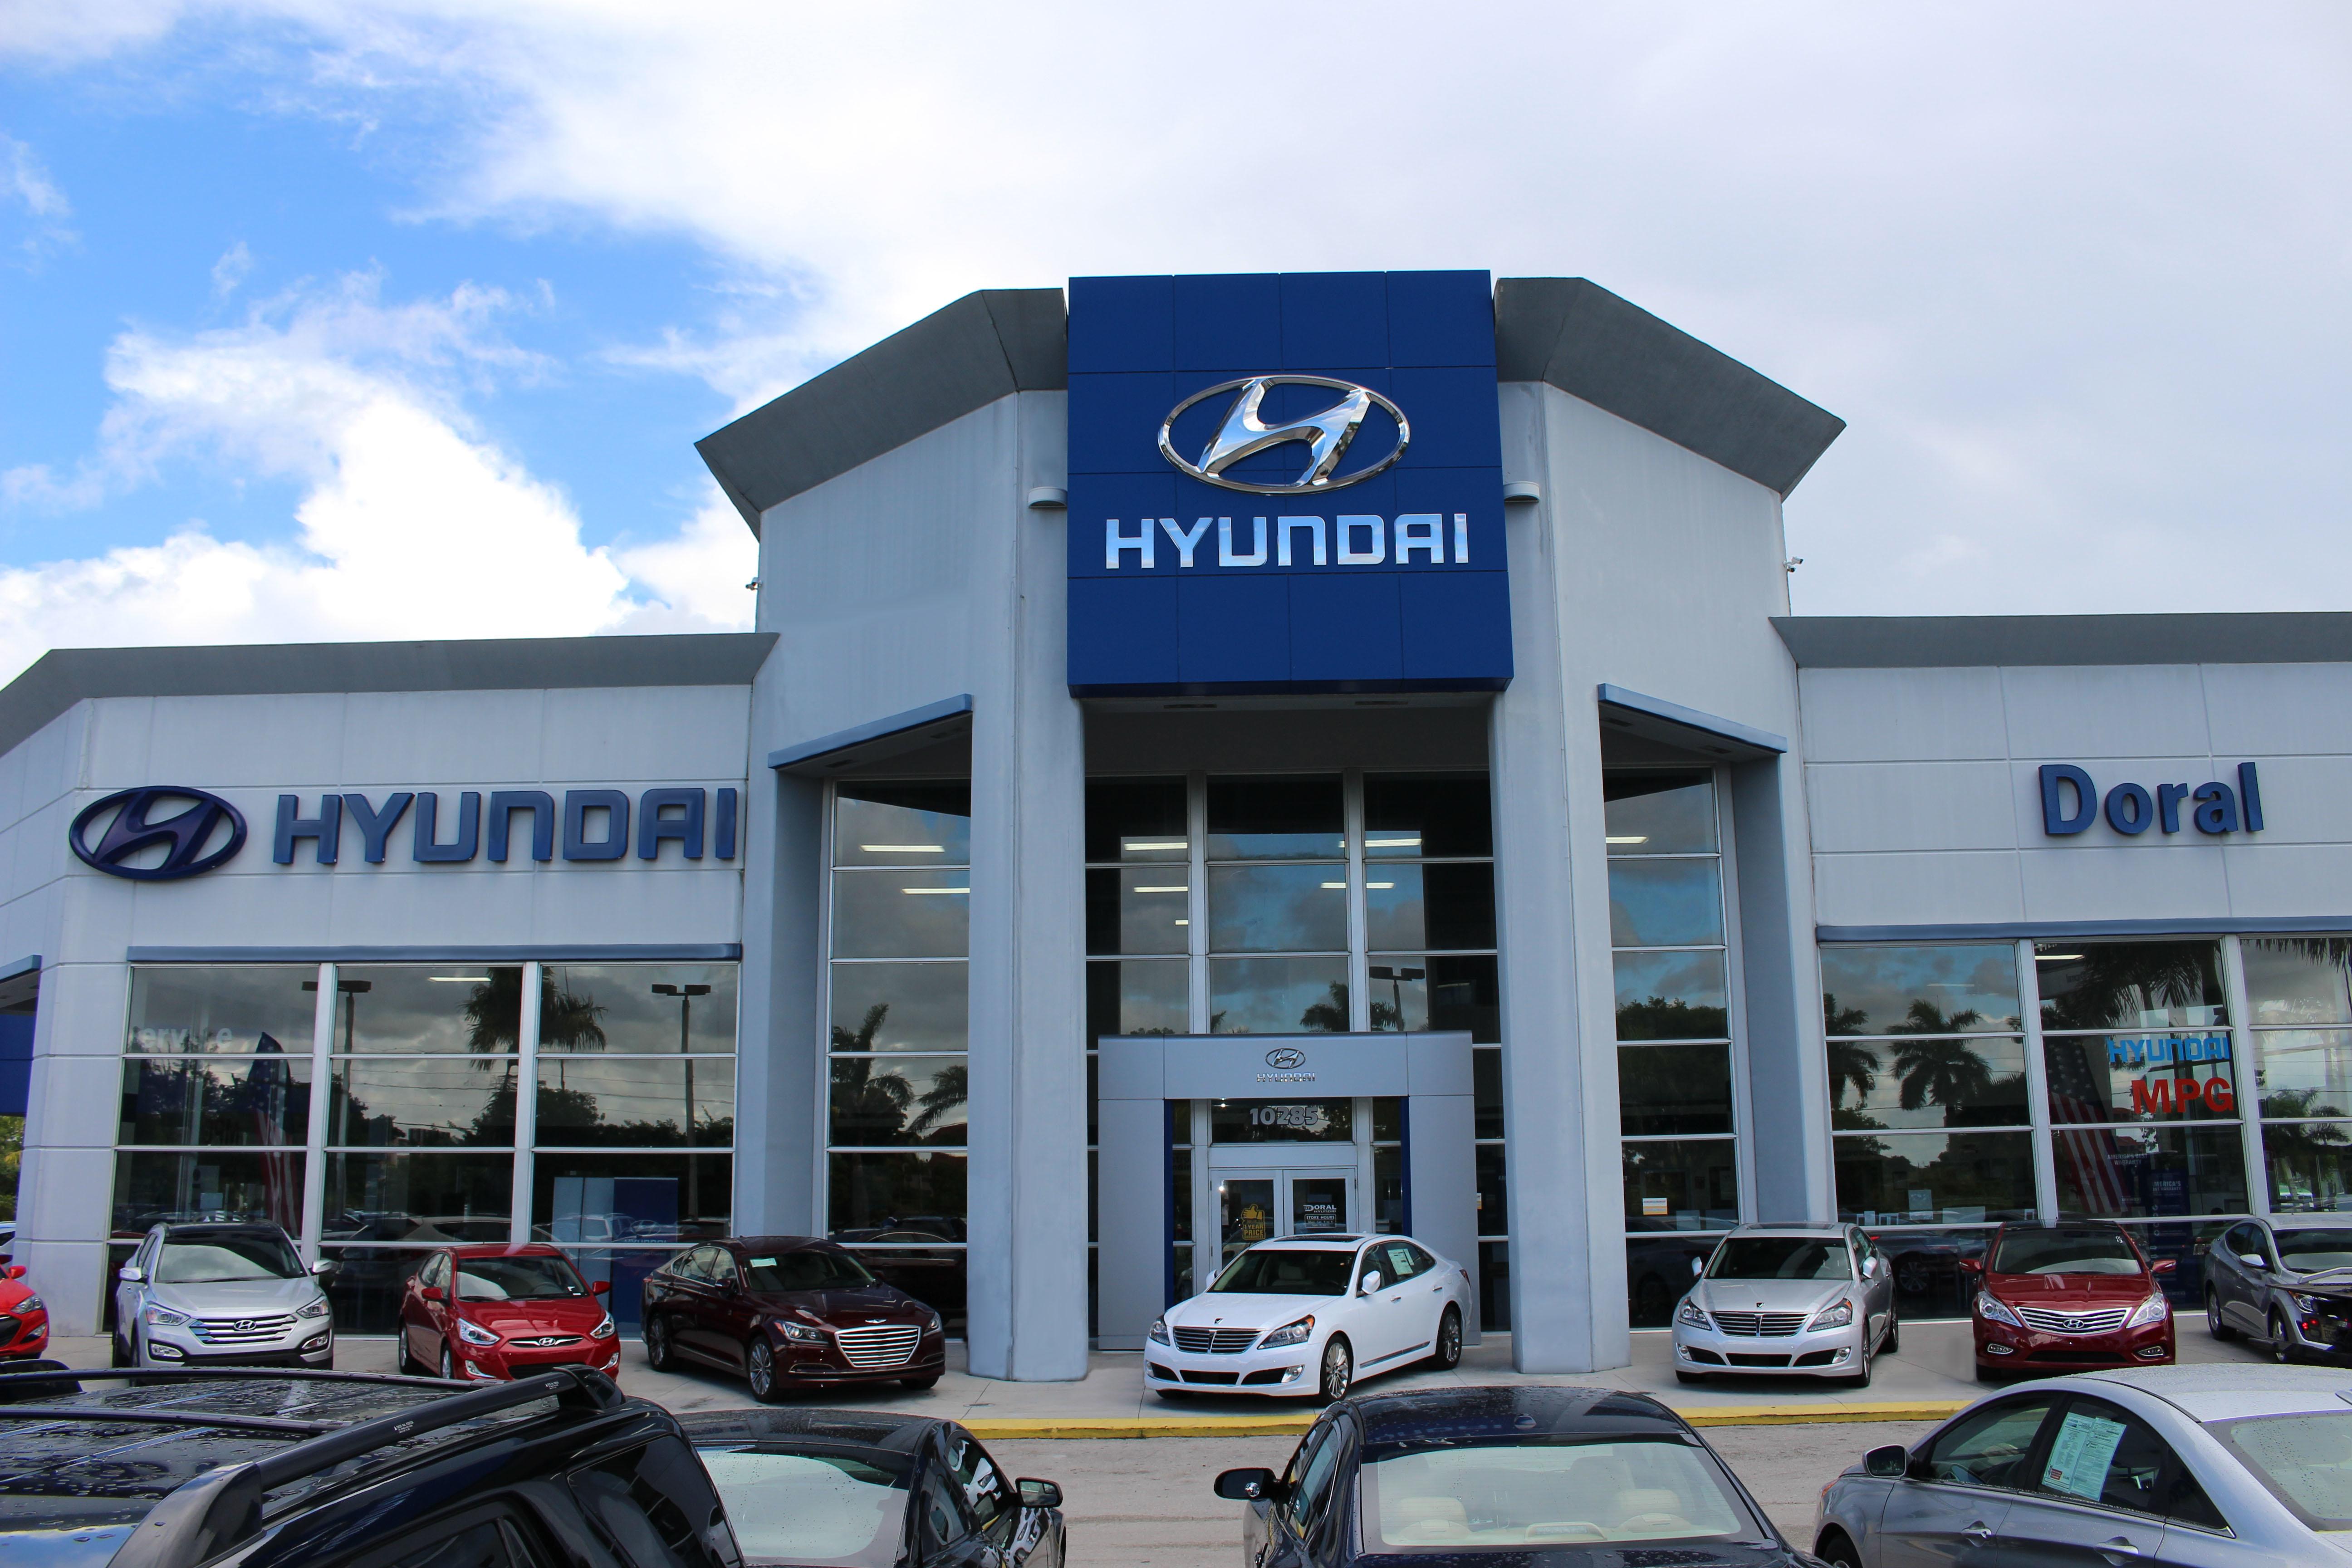 Doral Hyundai In Doral Fl 33172 Chamberofcommerce Com